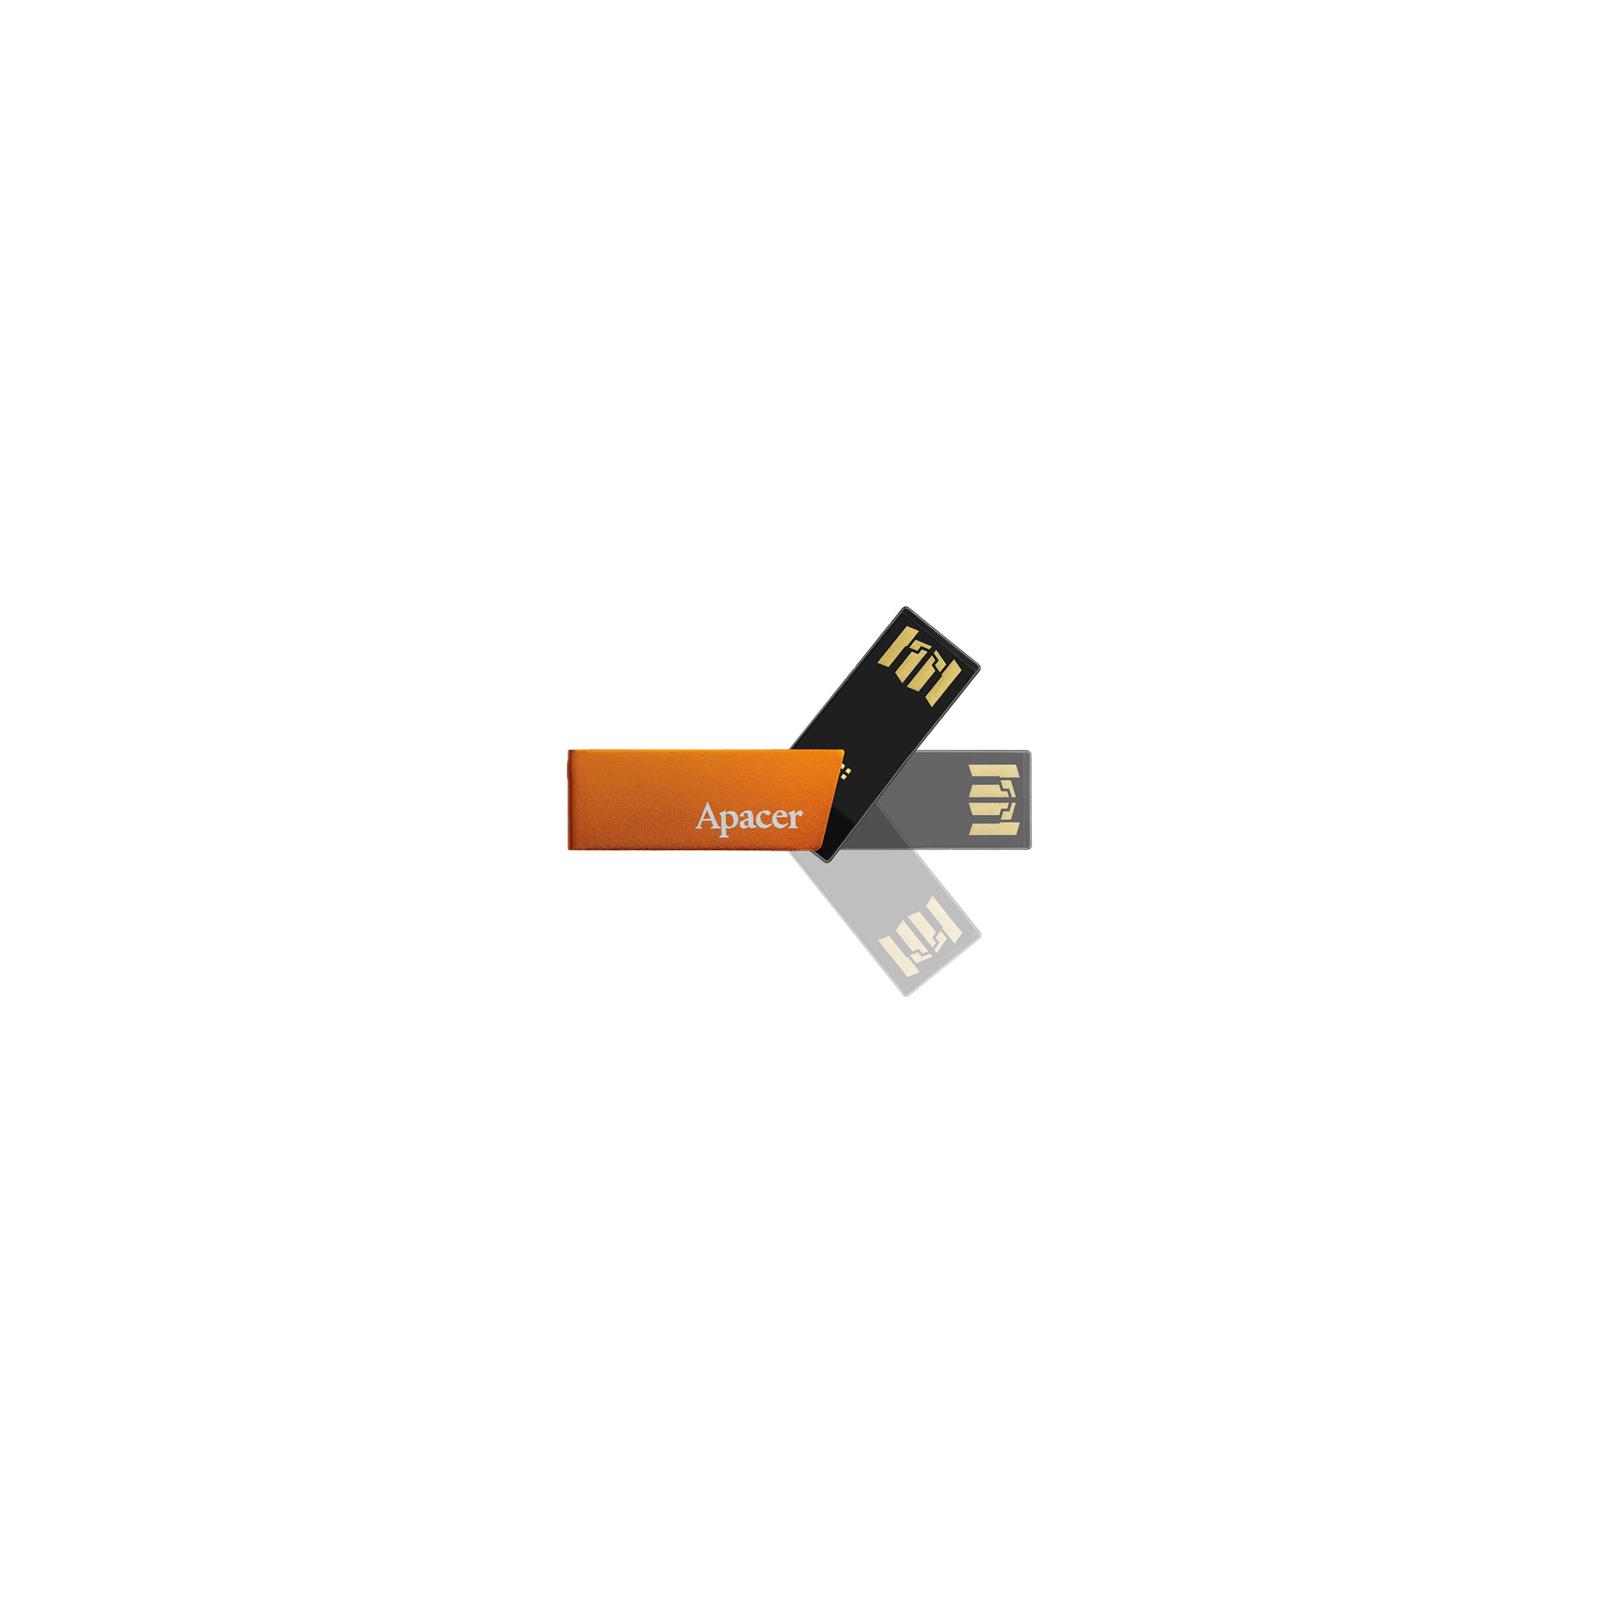 USB флеш накопитель 16GB AH130 Orange RP USB2.0 Apacer (AP16GAH130T-1) изображение 3